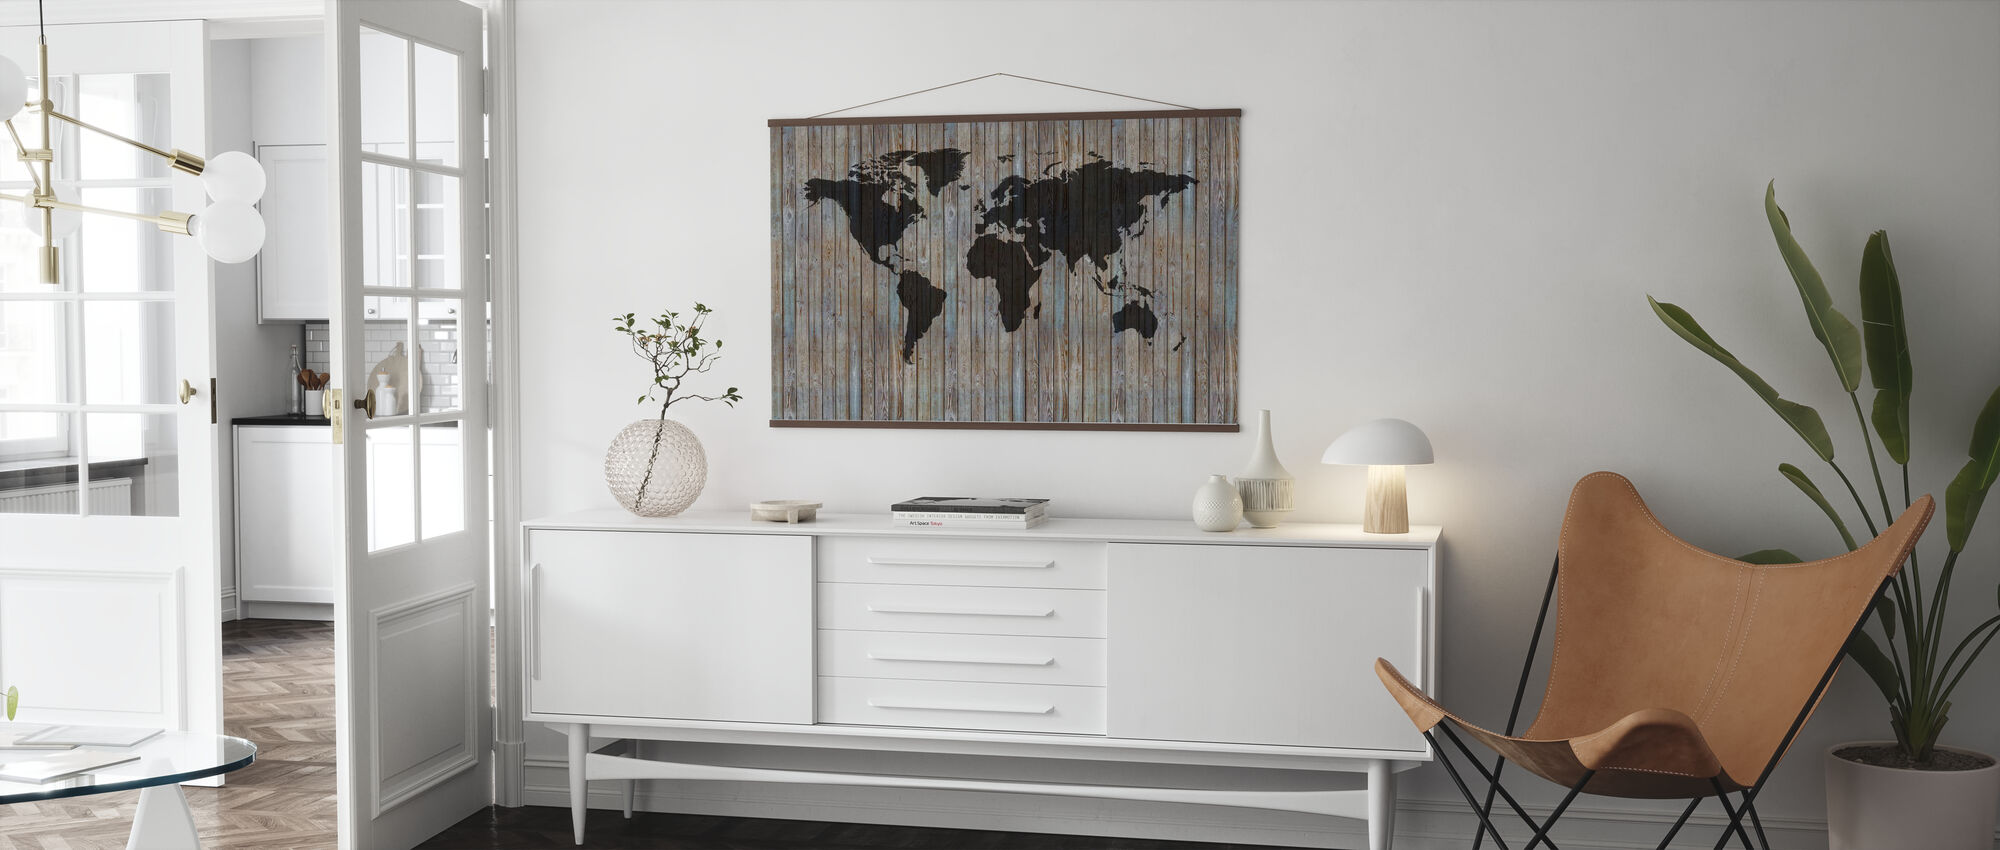 Weltkarte Holzdiele - Old Silver - Poster - Wohnzimmer